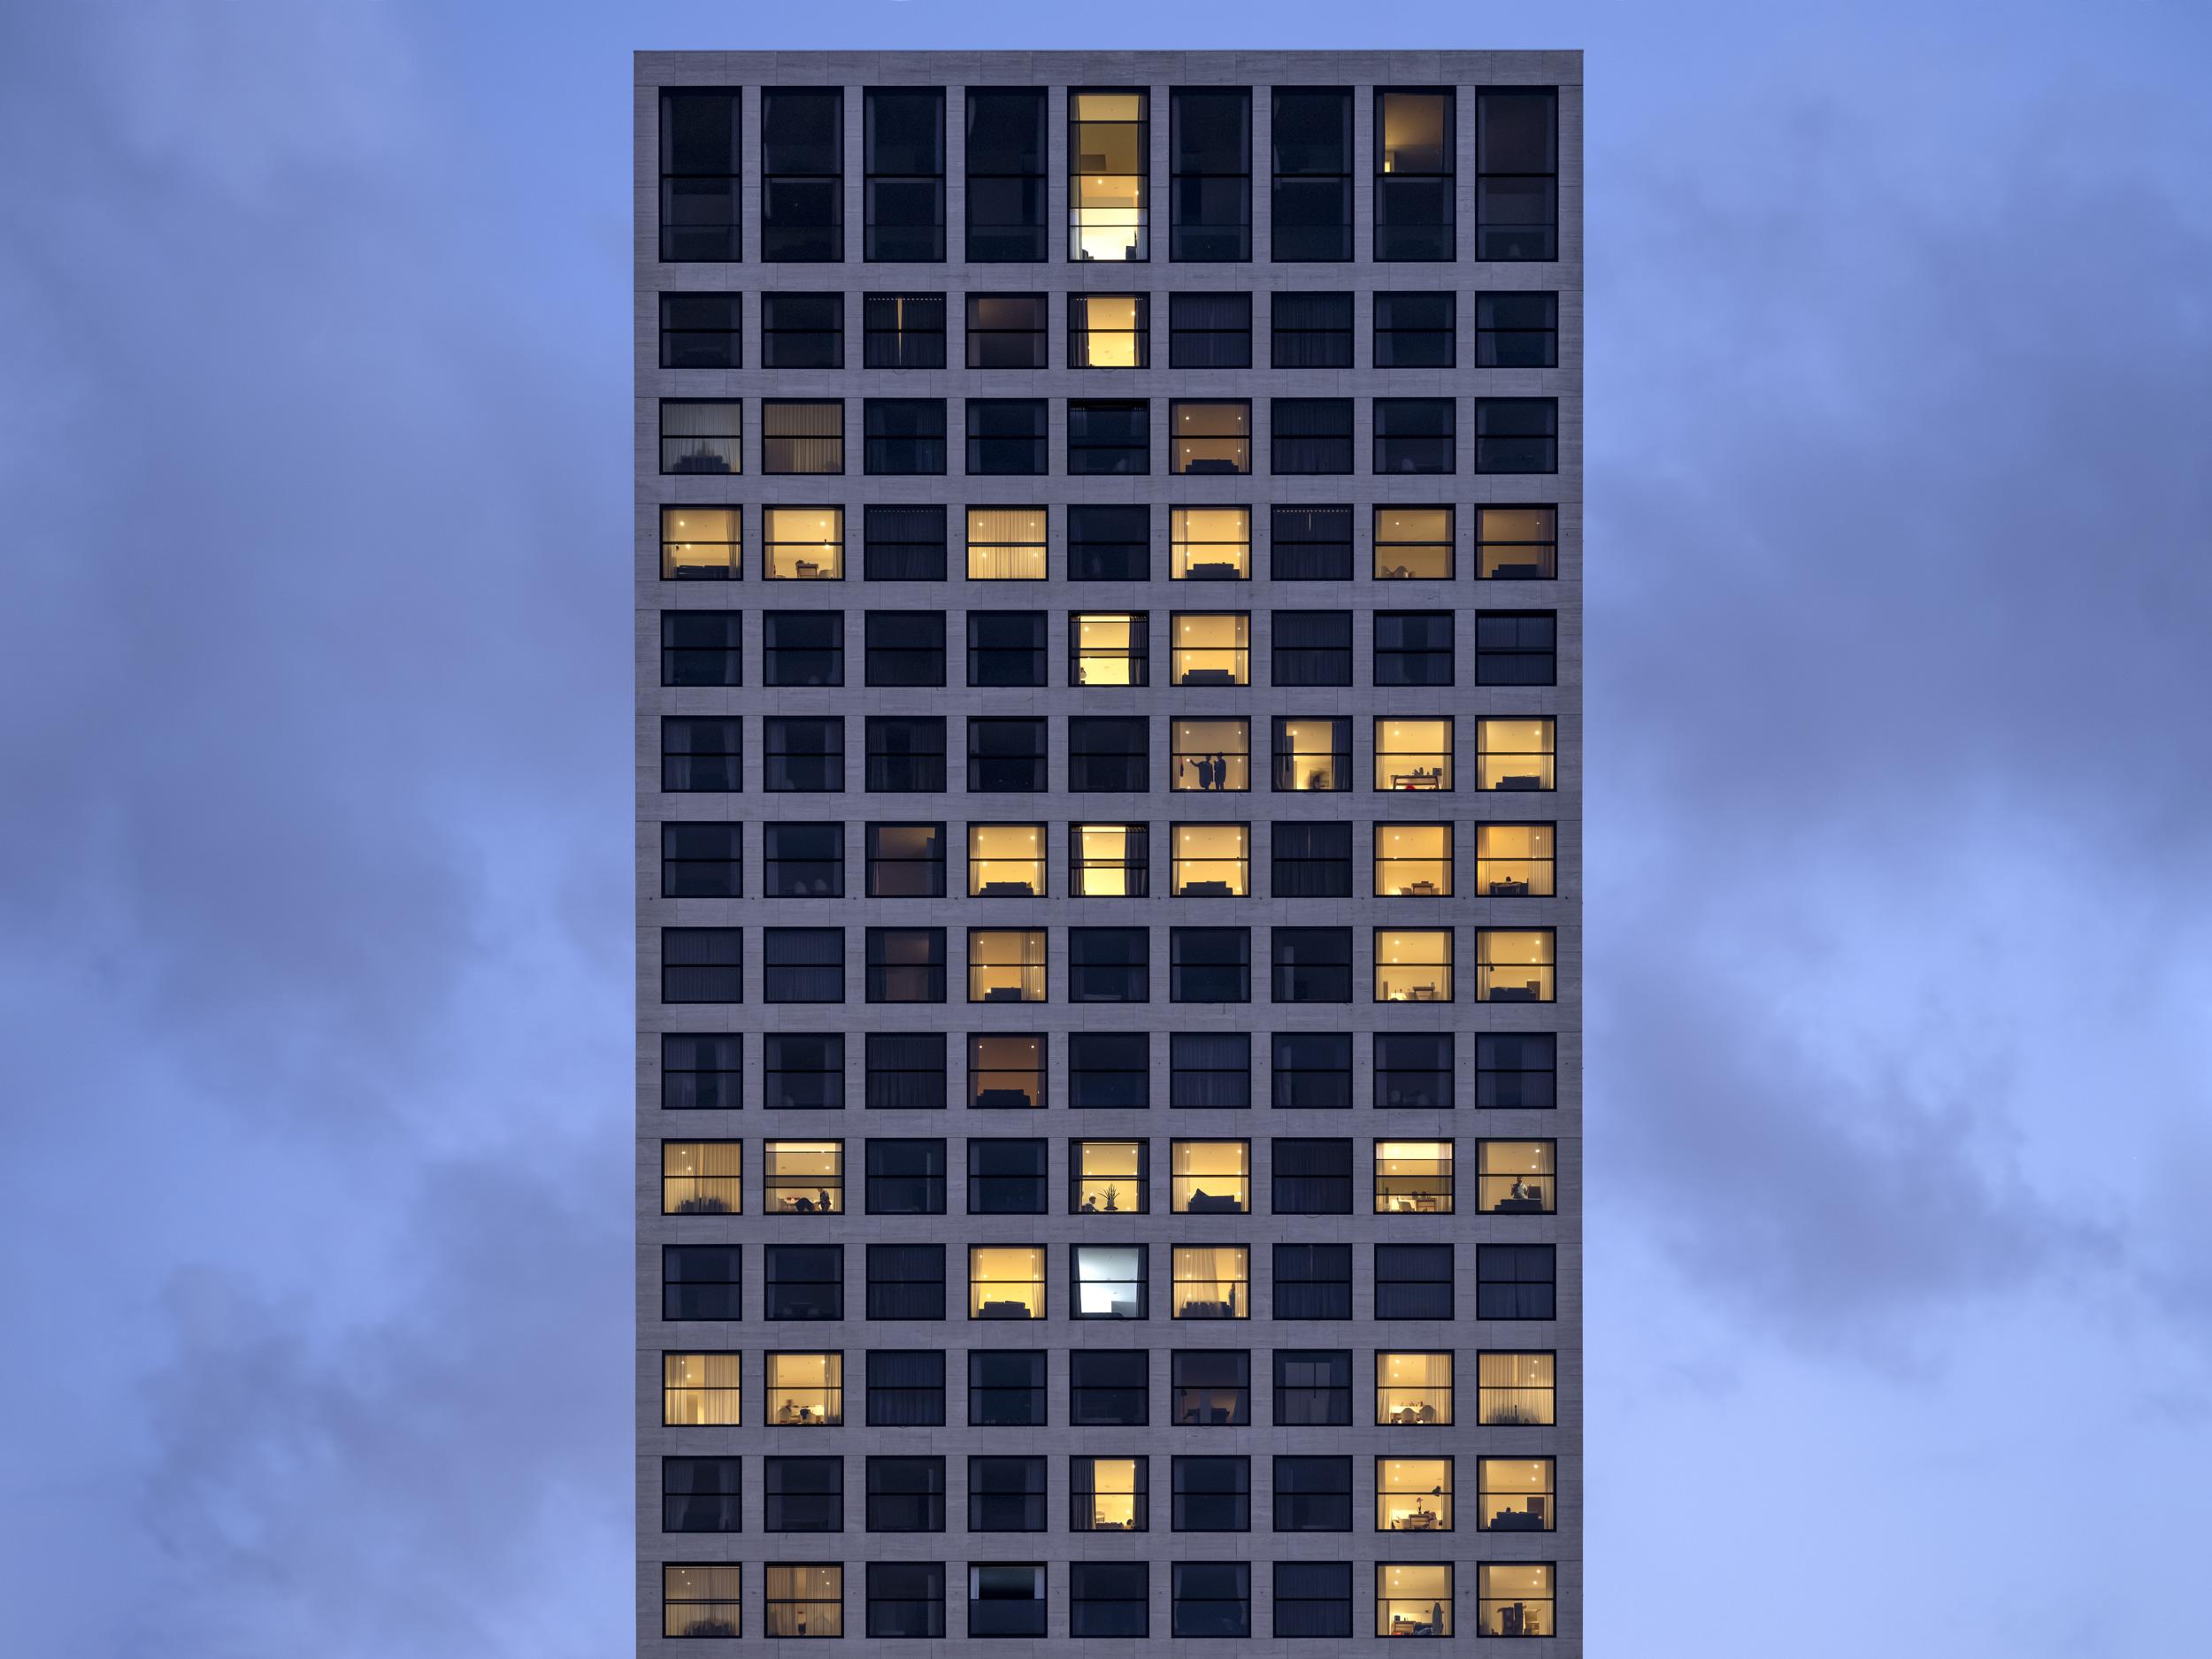 046-VB-Ossip-van-Duivenbode-Lee-Towers